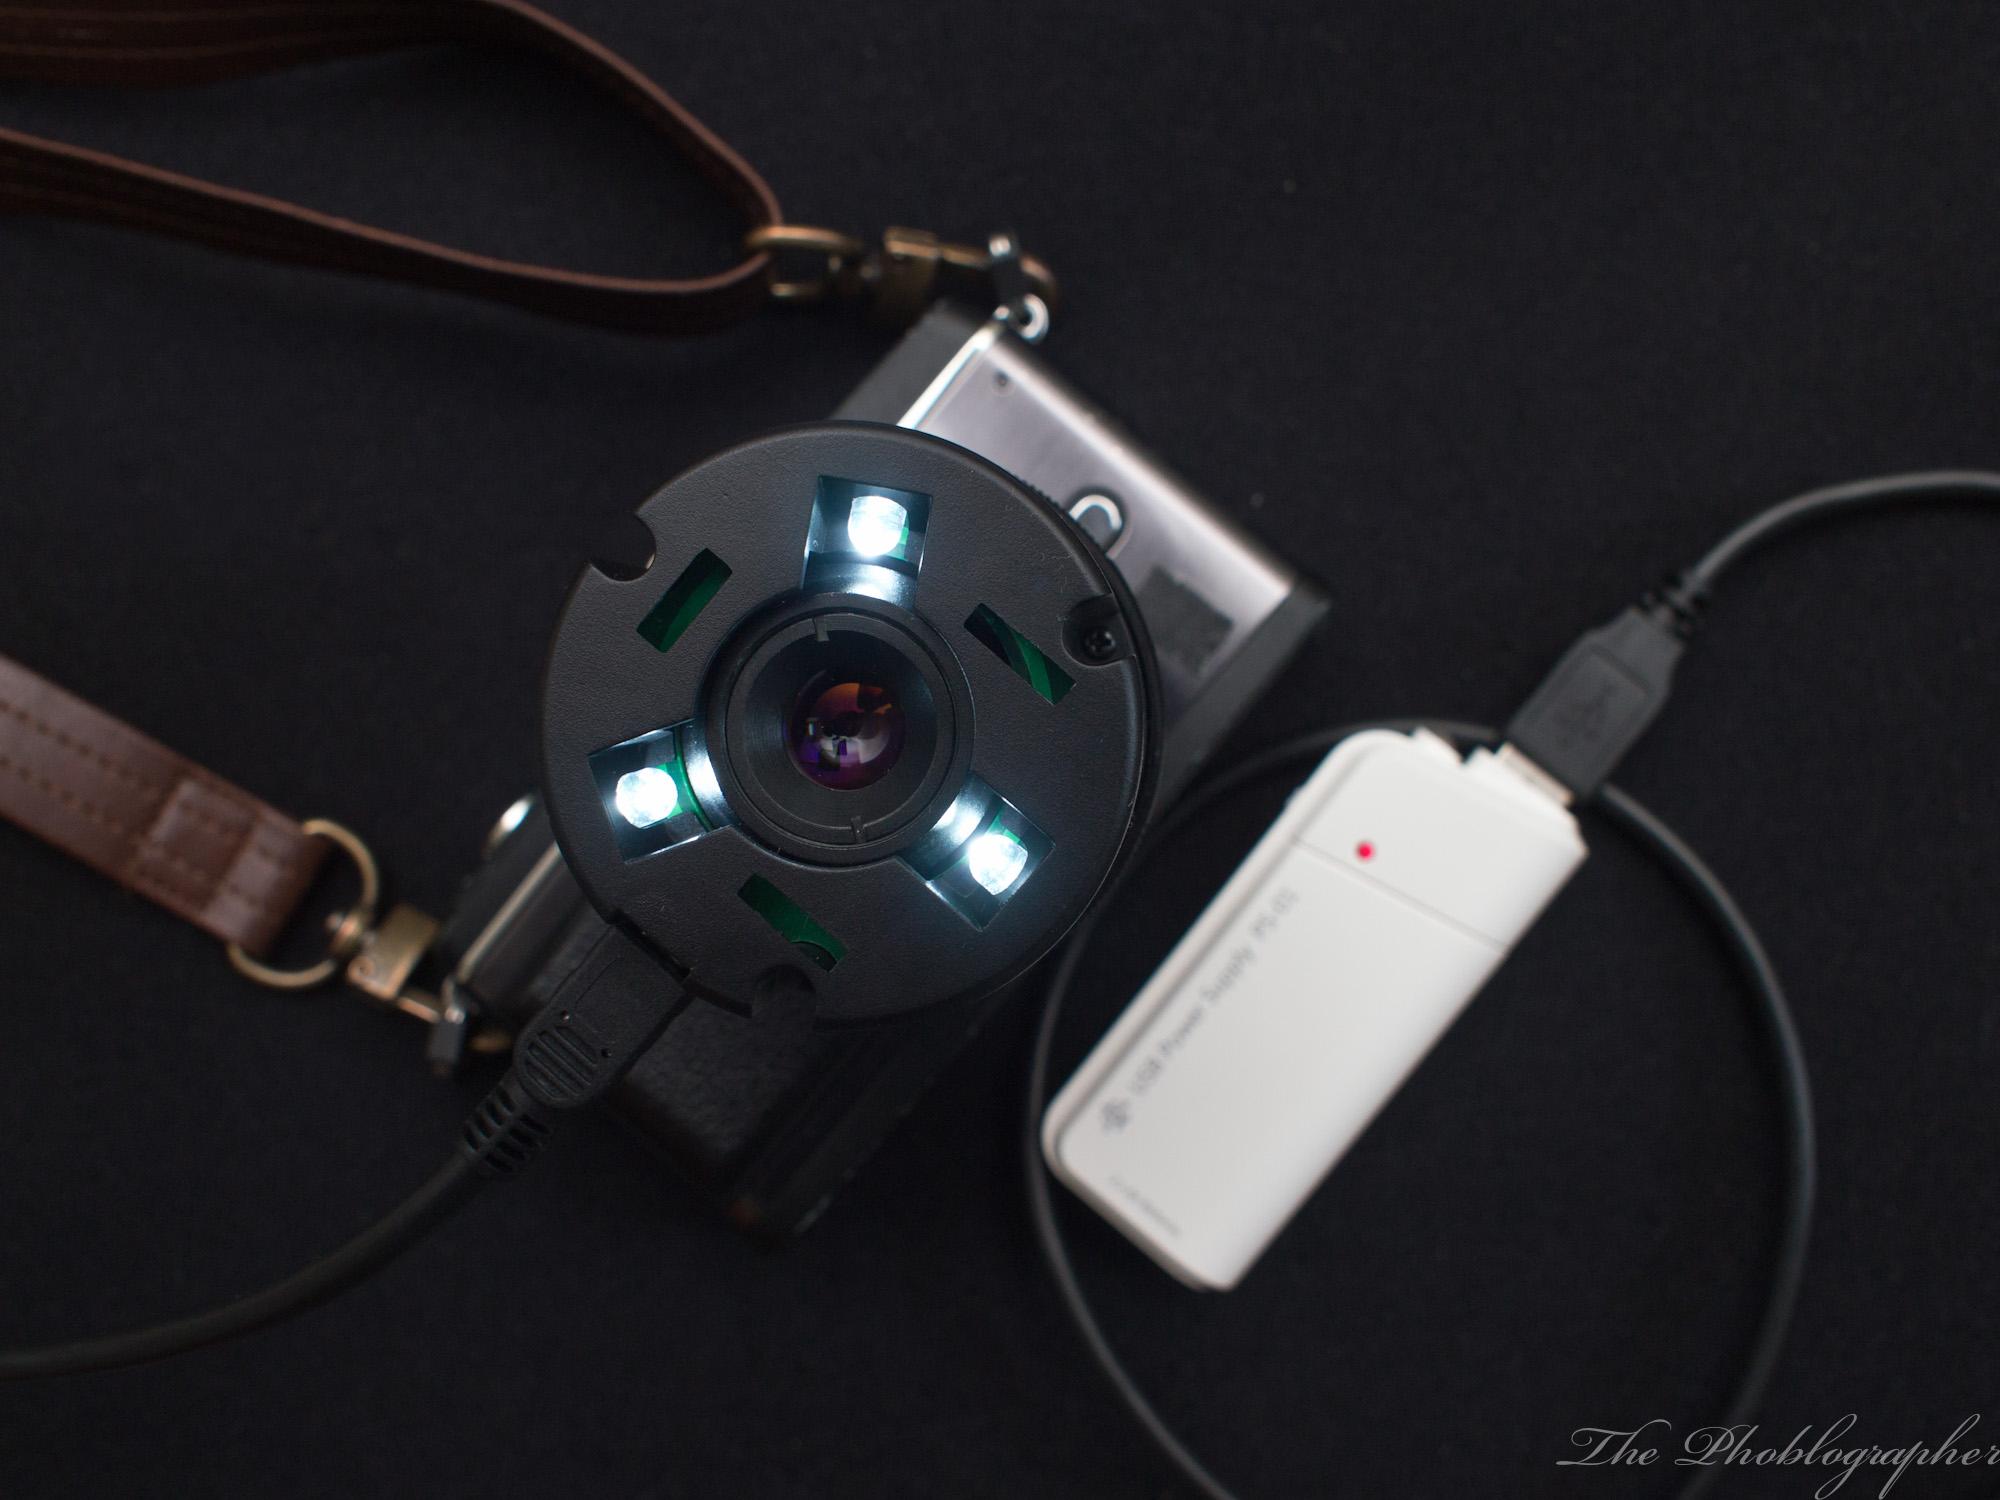 Chris Gampat The Phoblographer Yasuhara Nanohax5 hands on review (6 of 16)